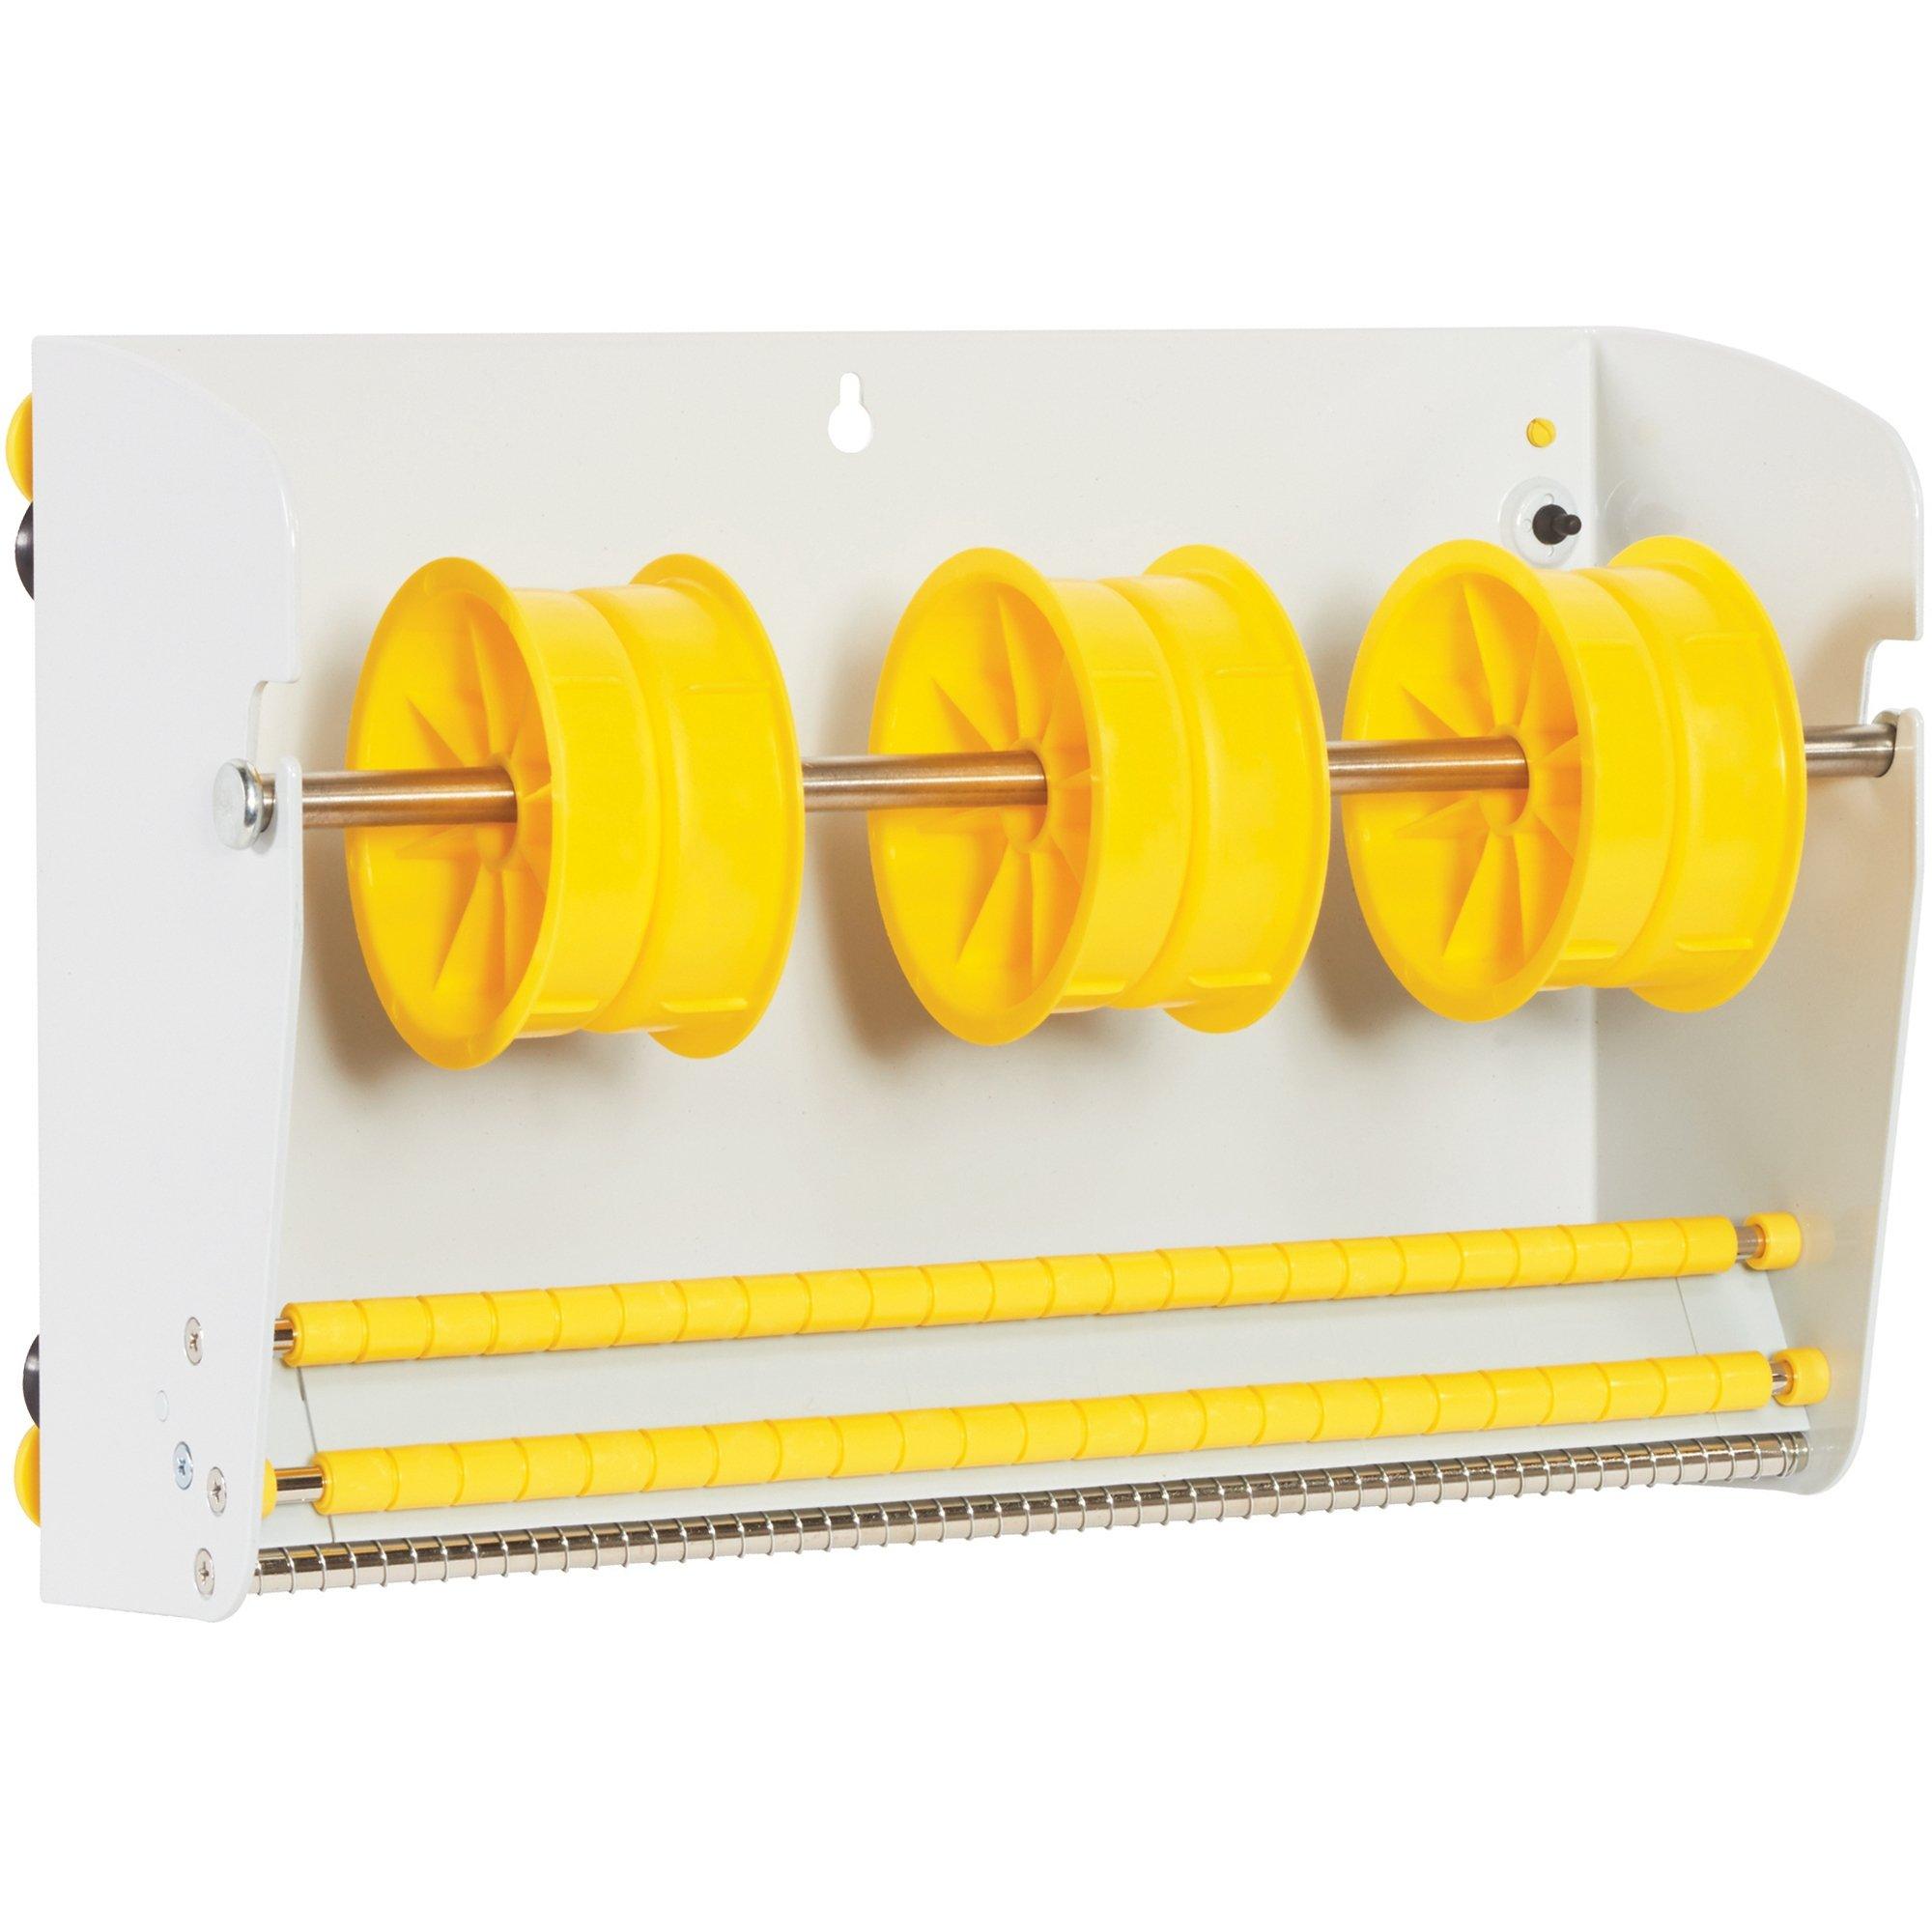 Aviditi Metal Wall Mount Label Dispenser, 12''-1/2'', Off White (LDM1250) by Aviditi